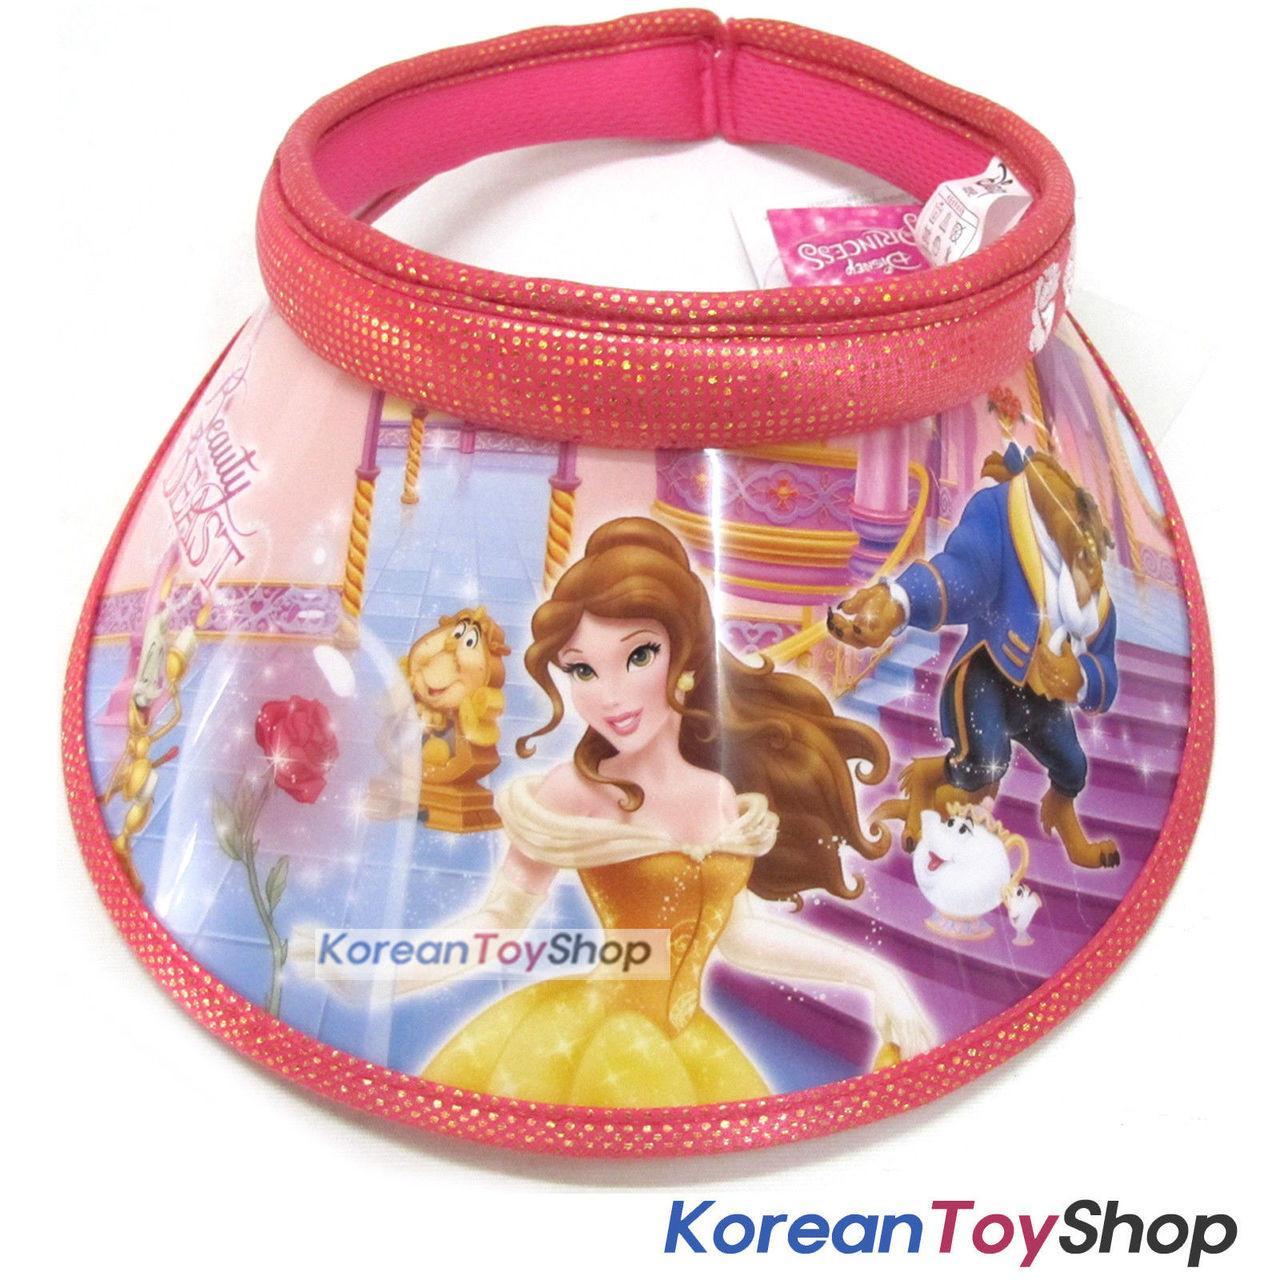 54c1aafa3f25c Disney Beauty and the Beast Visor Hat Sun Cap Kids Girl ROSE N.03 -  KoreanToyShop